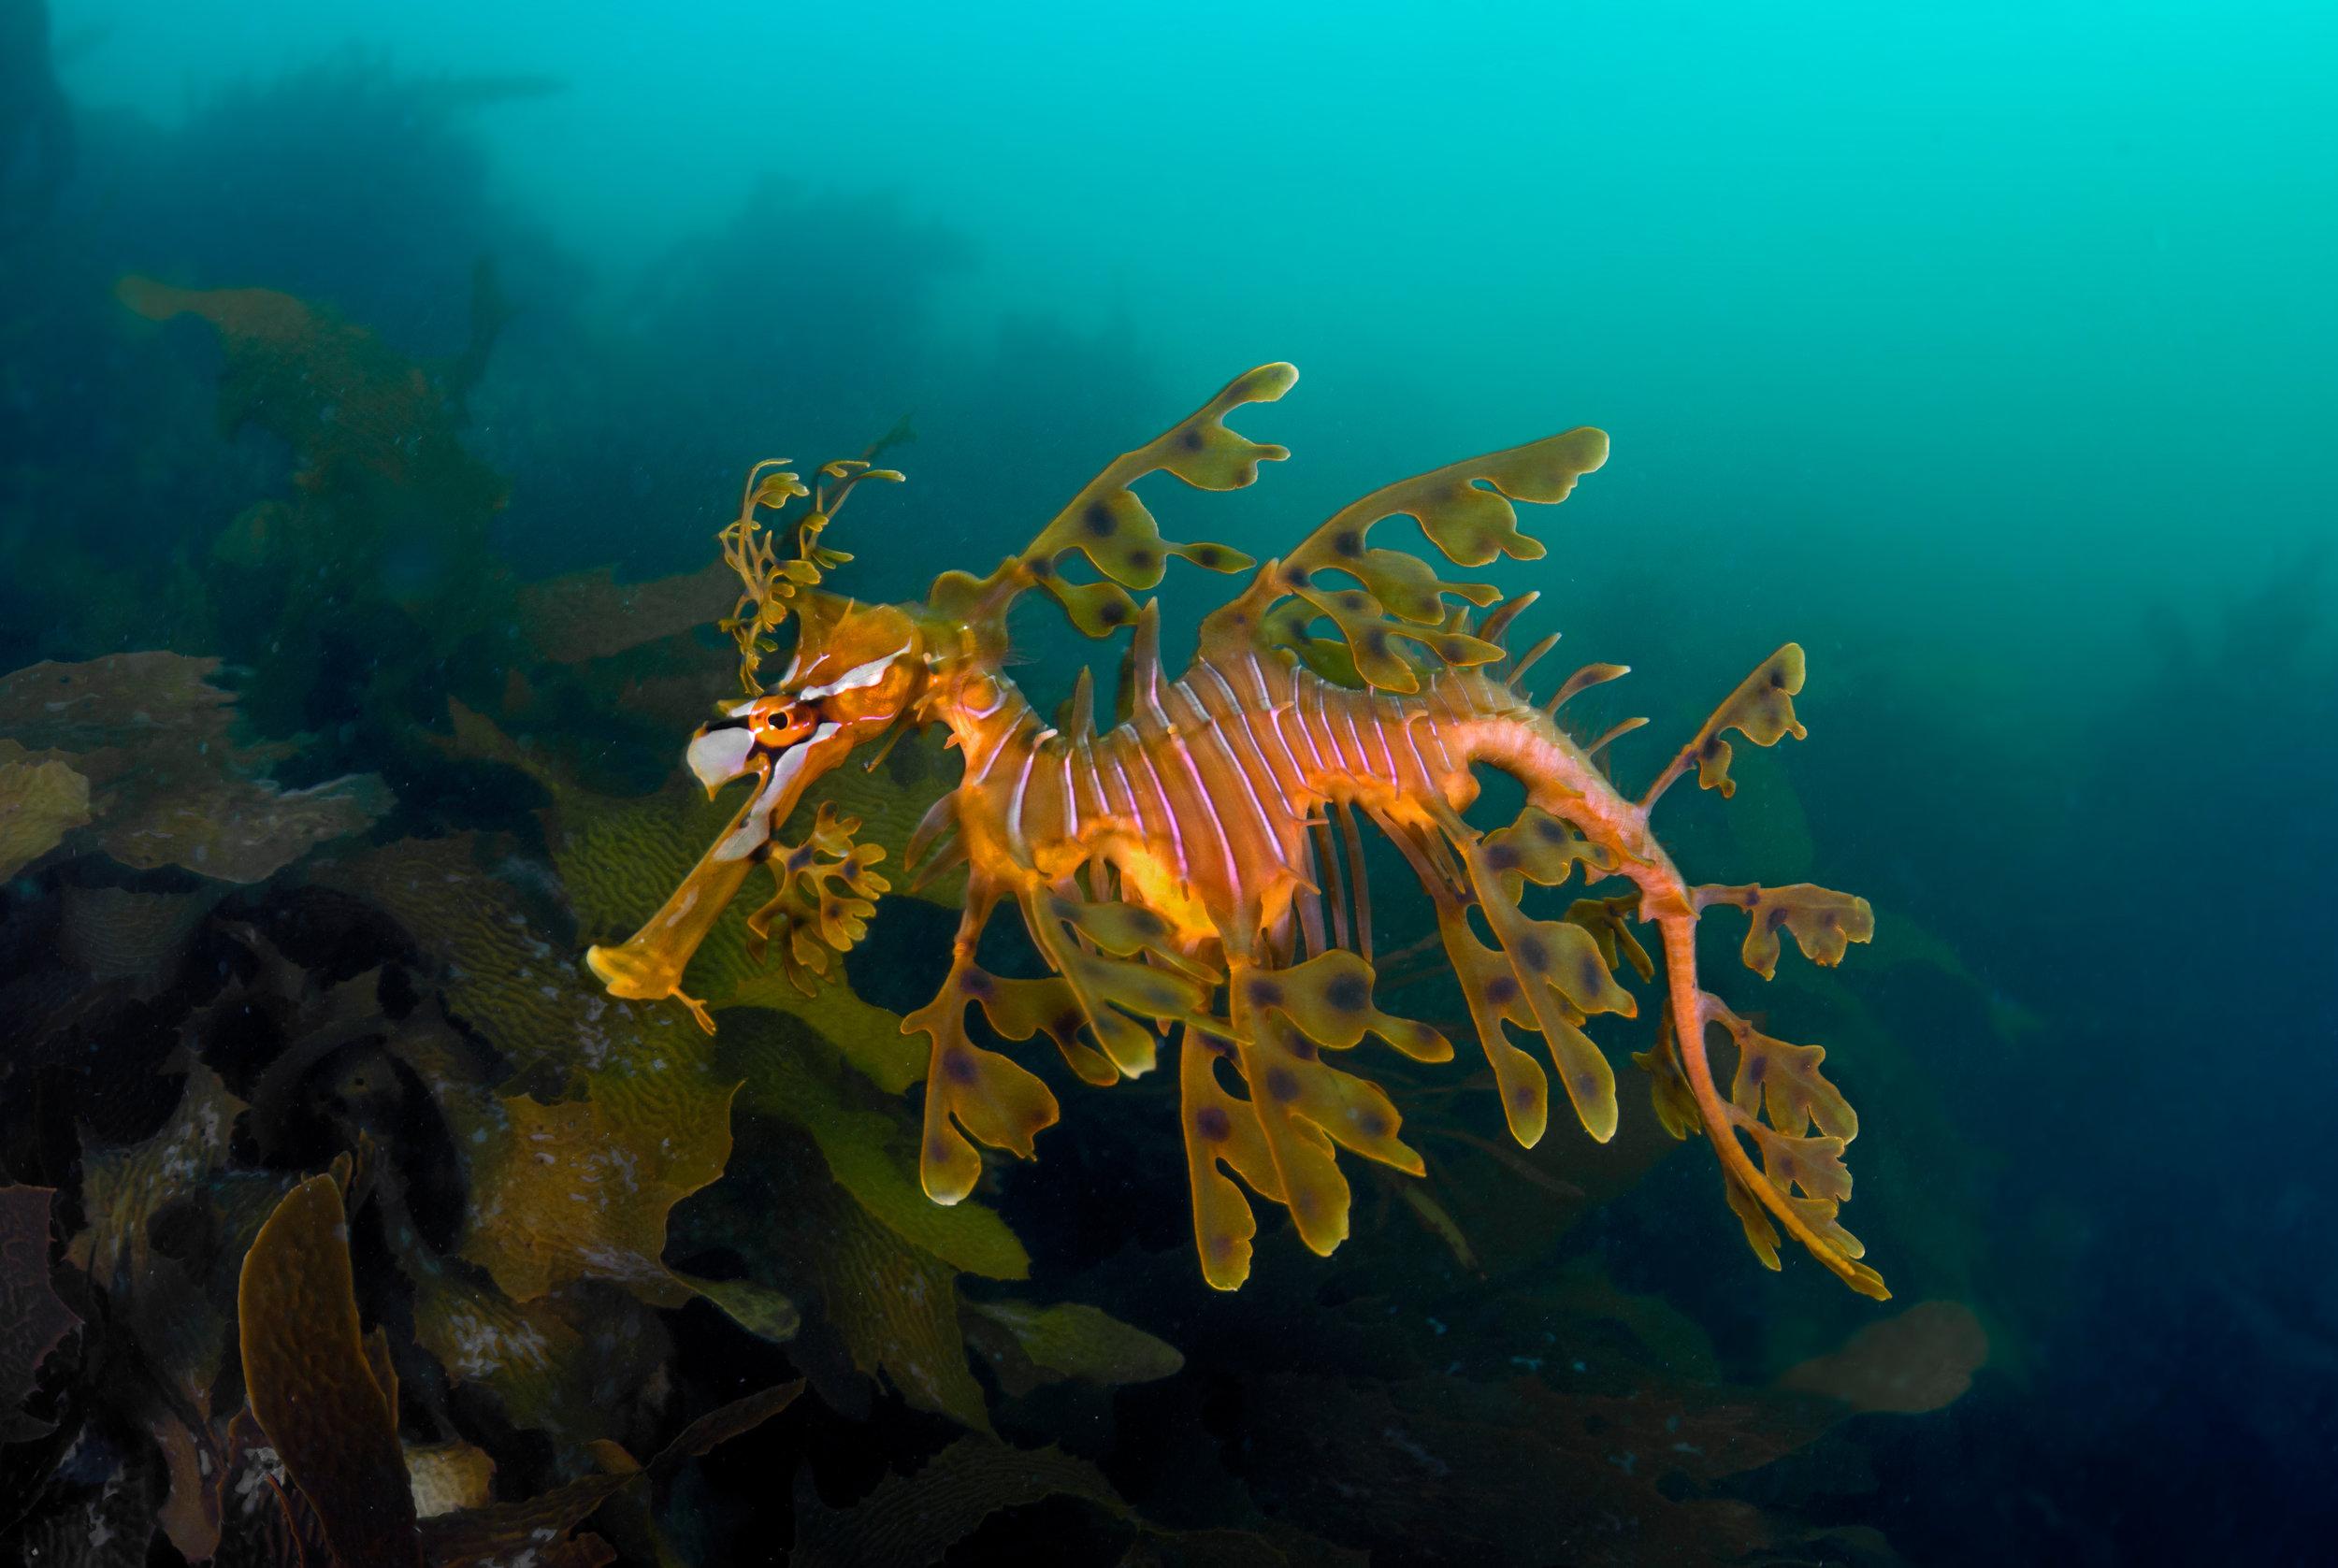 Phycodurus eques / Photo By Gaetano Gargiulo / Guylian Seahorses of the world